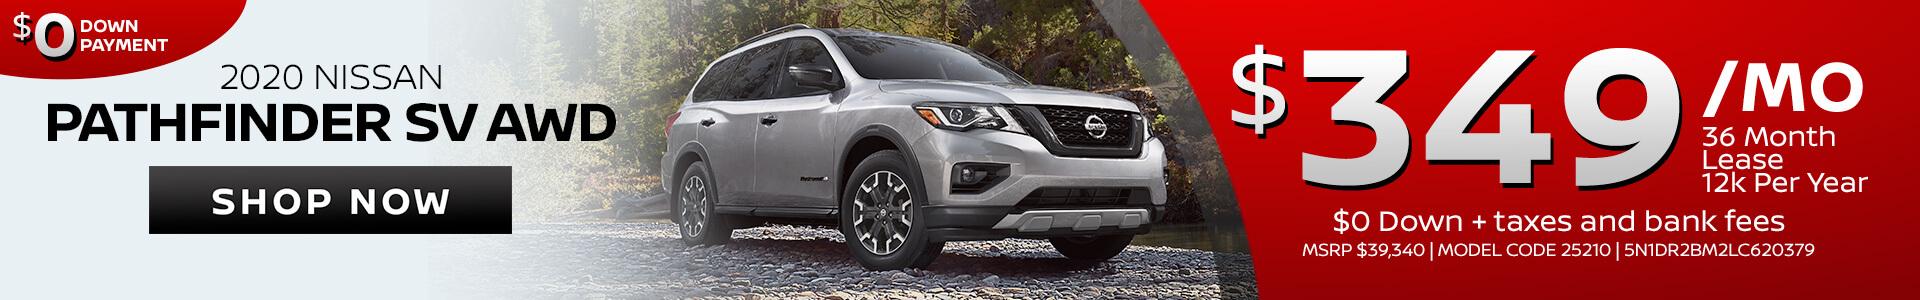 Nissan Pathfinder $349 Lease